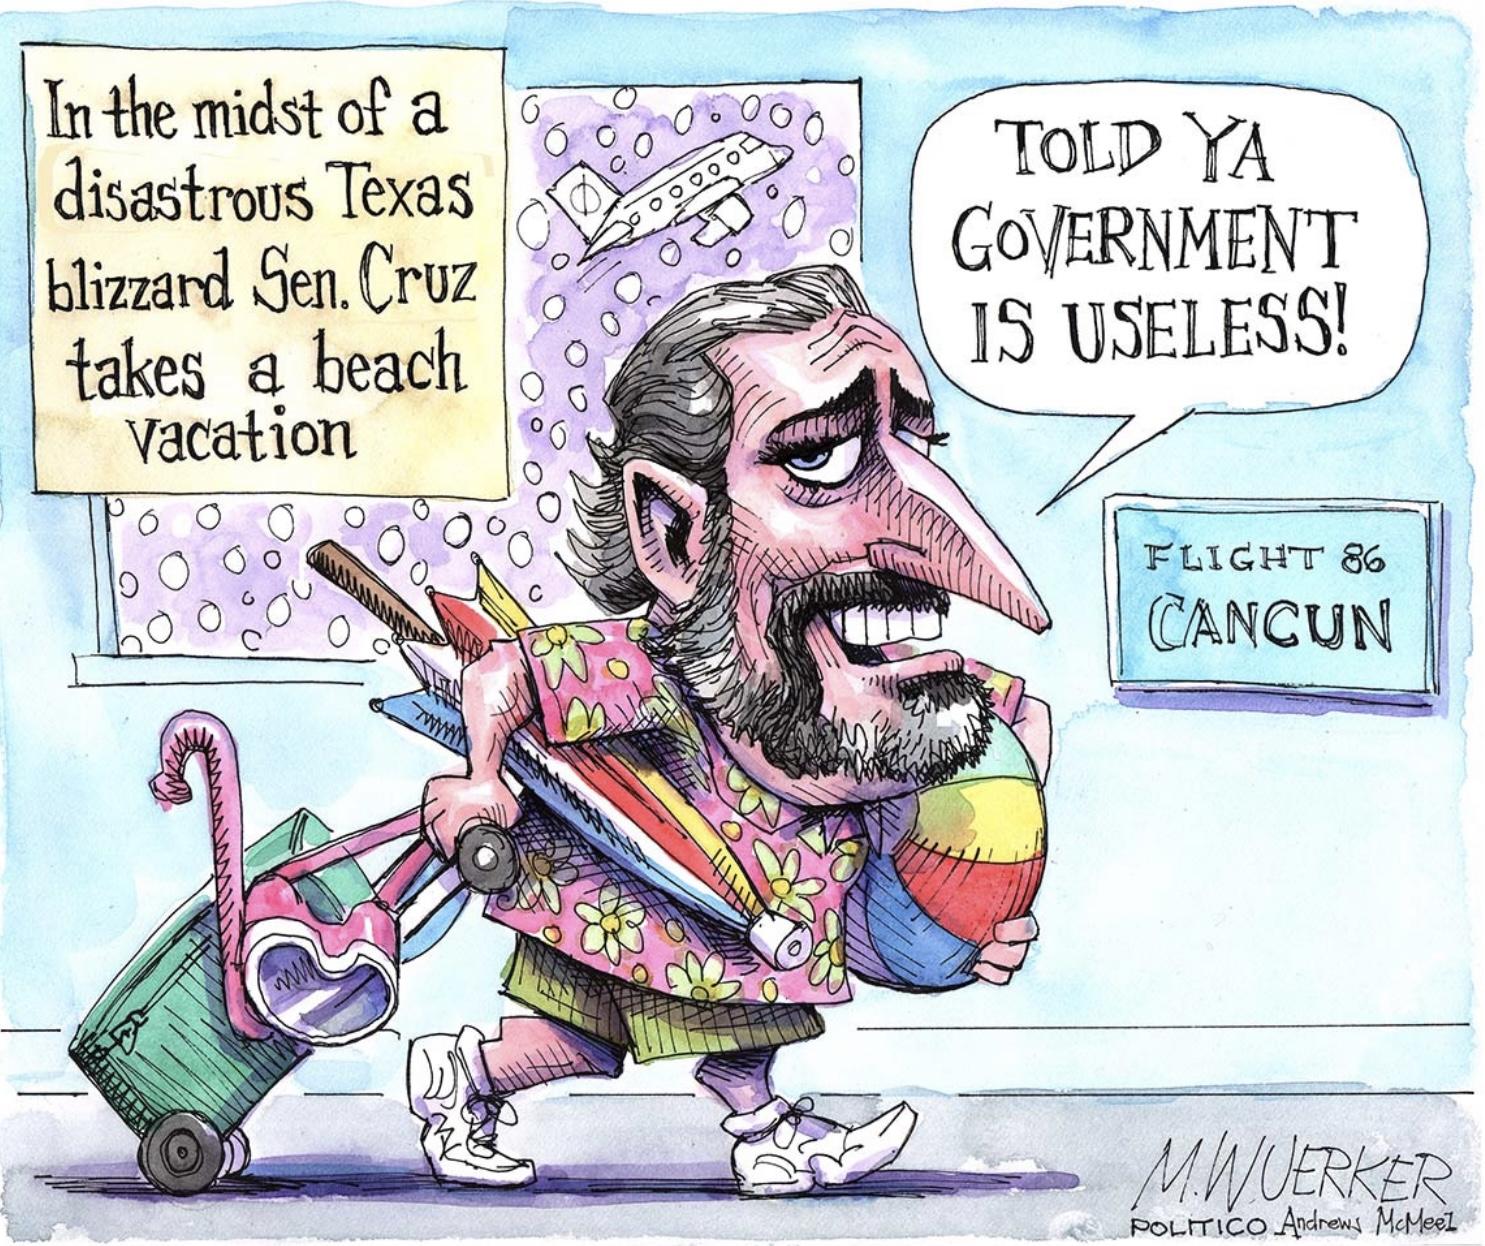 Political cartoons - the 'funny' pics thread.-b0aa72a5-b86c-4b78-91a1-2a1e8208e310-jpeg